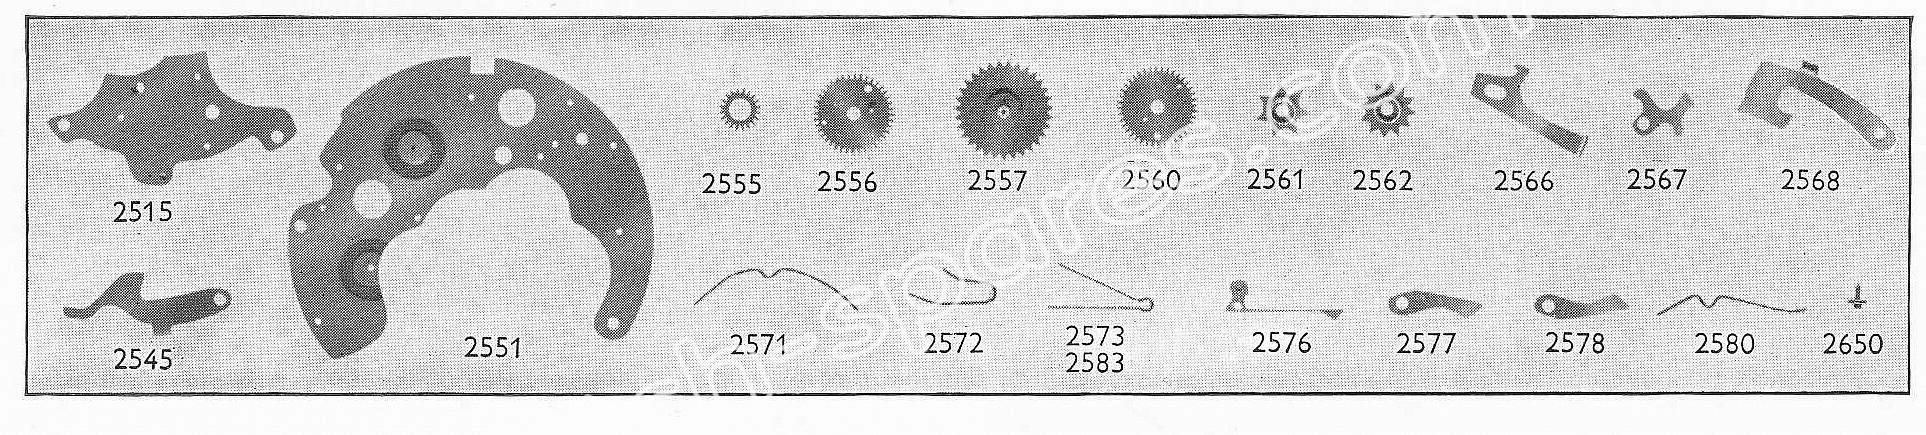 Landeron 186 watch date spare parts